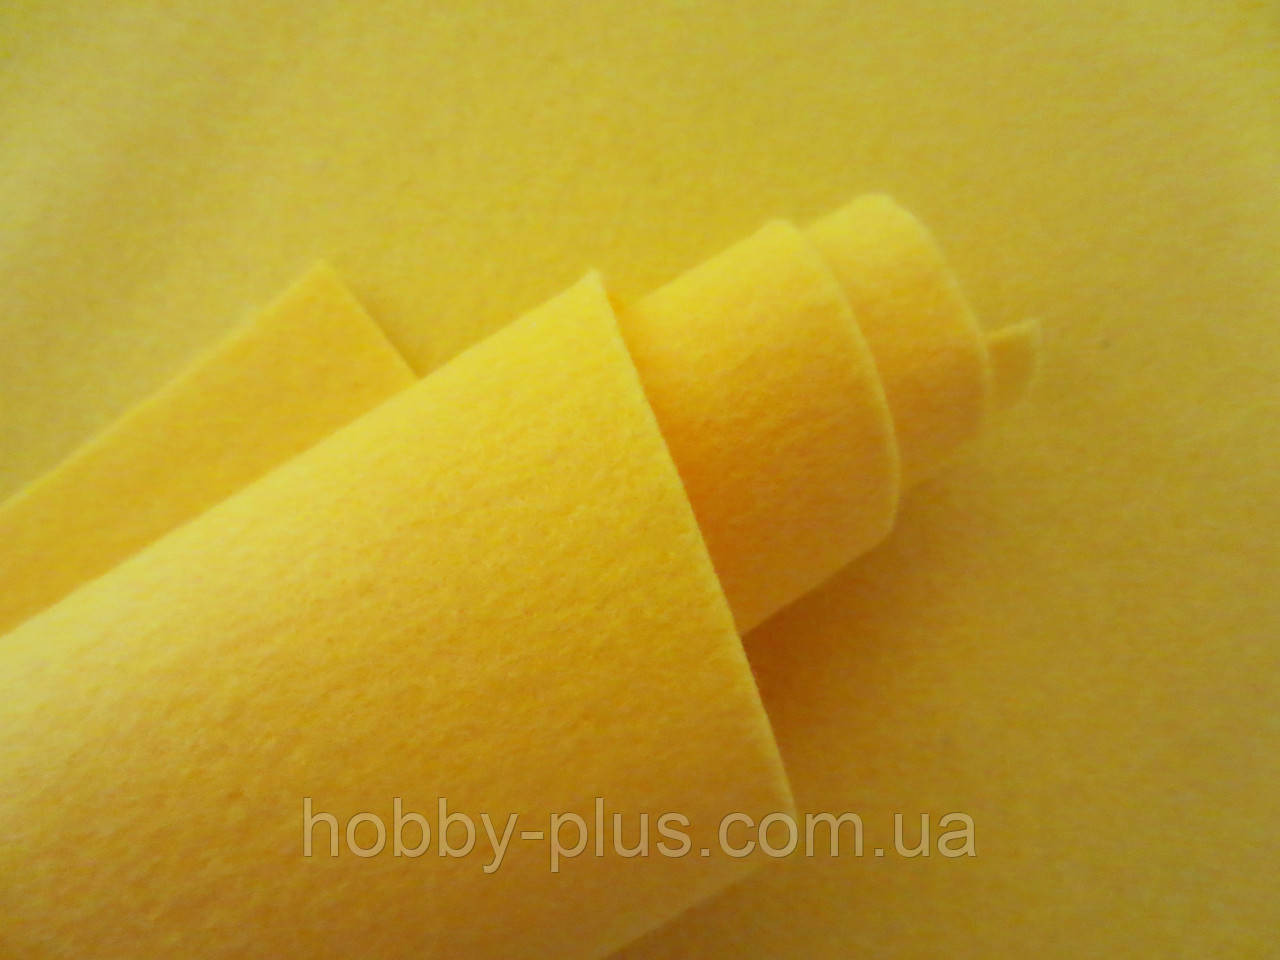 Фетр корейский мягкий, 1.2 мм, 20x30 см, ЖЕЛТЫЙ